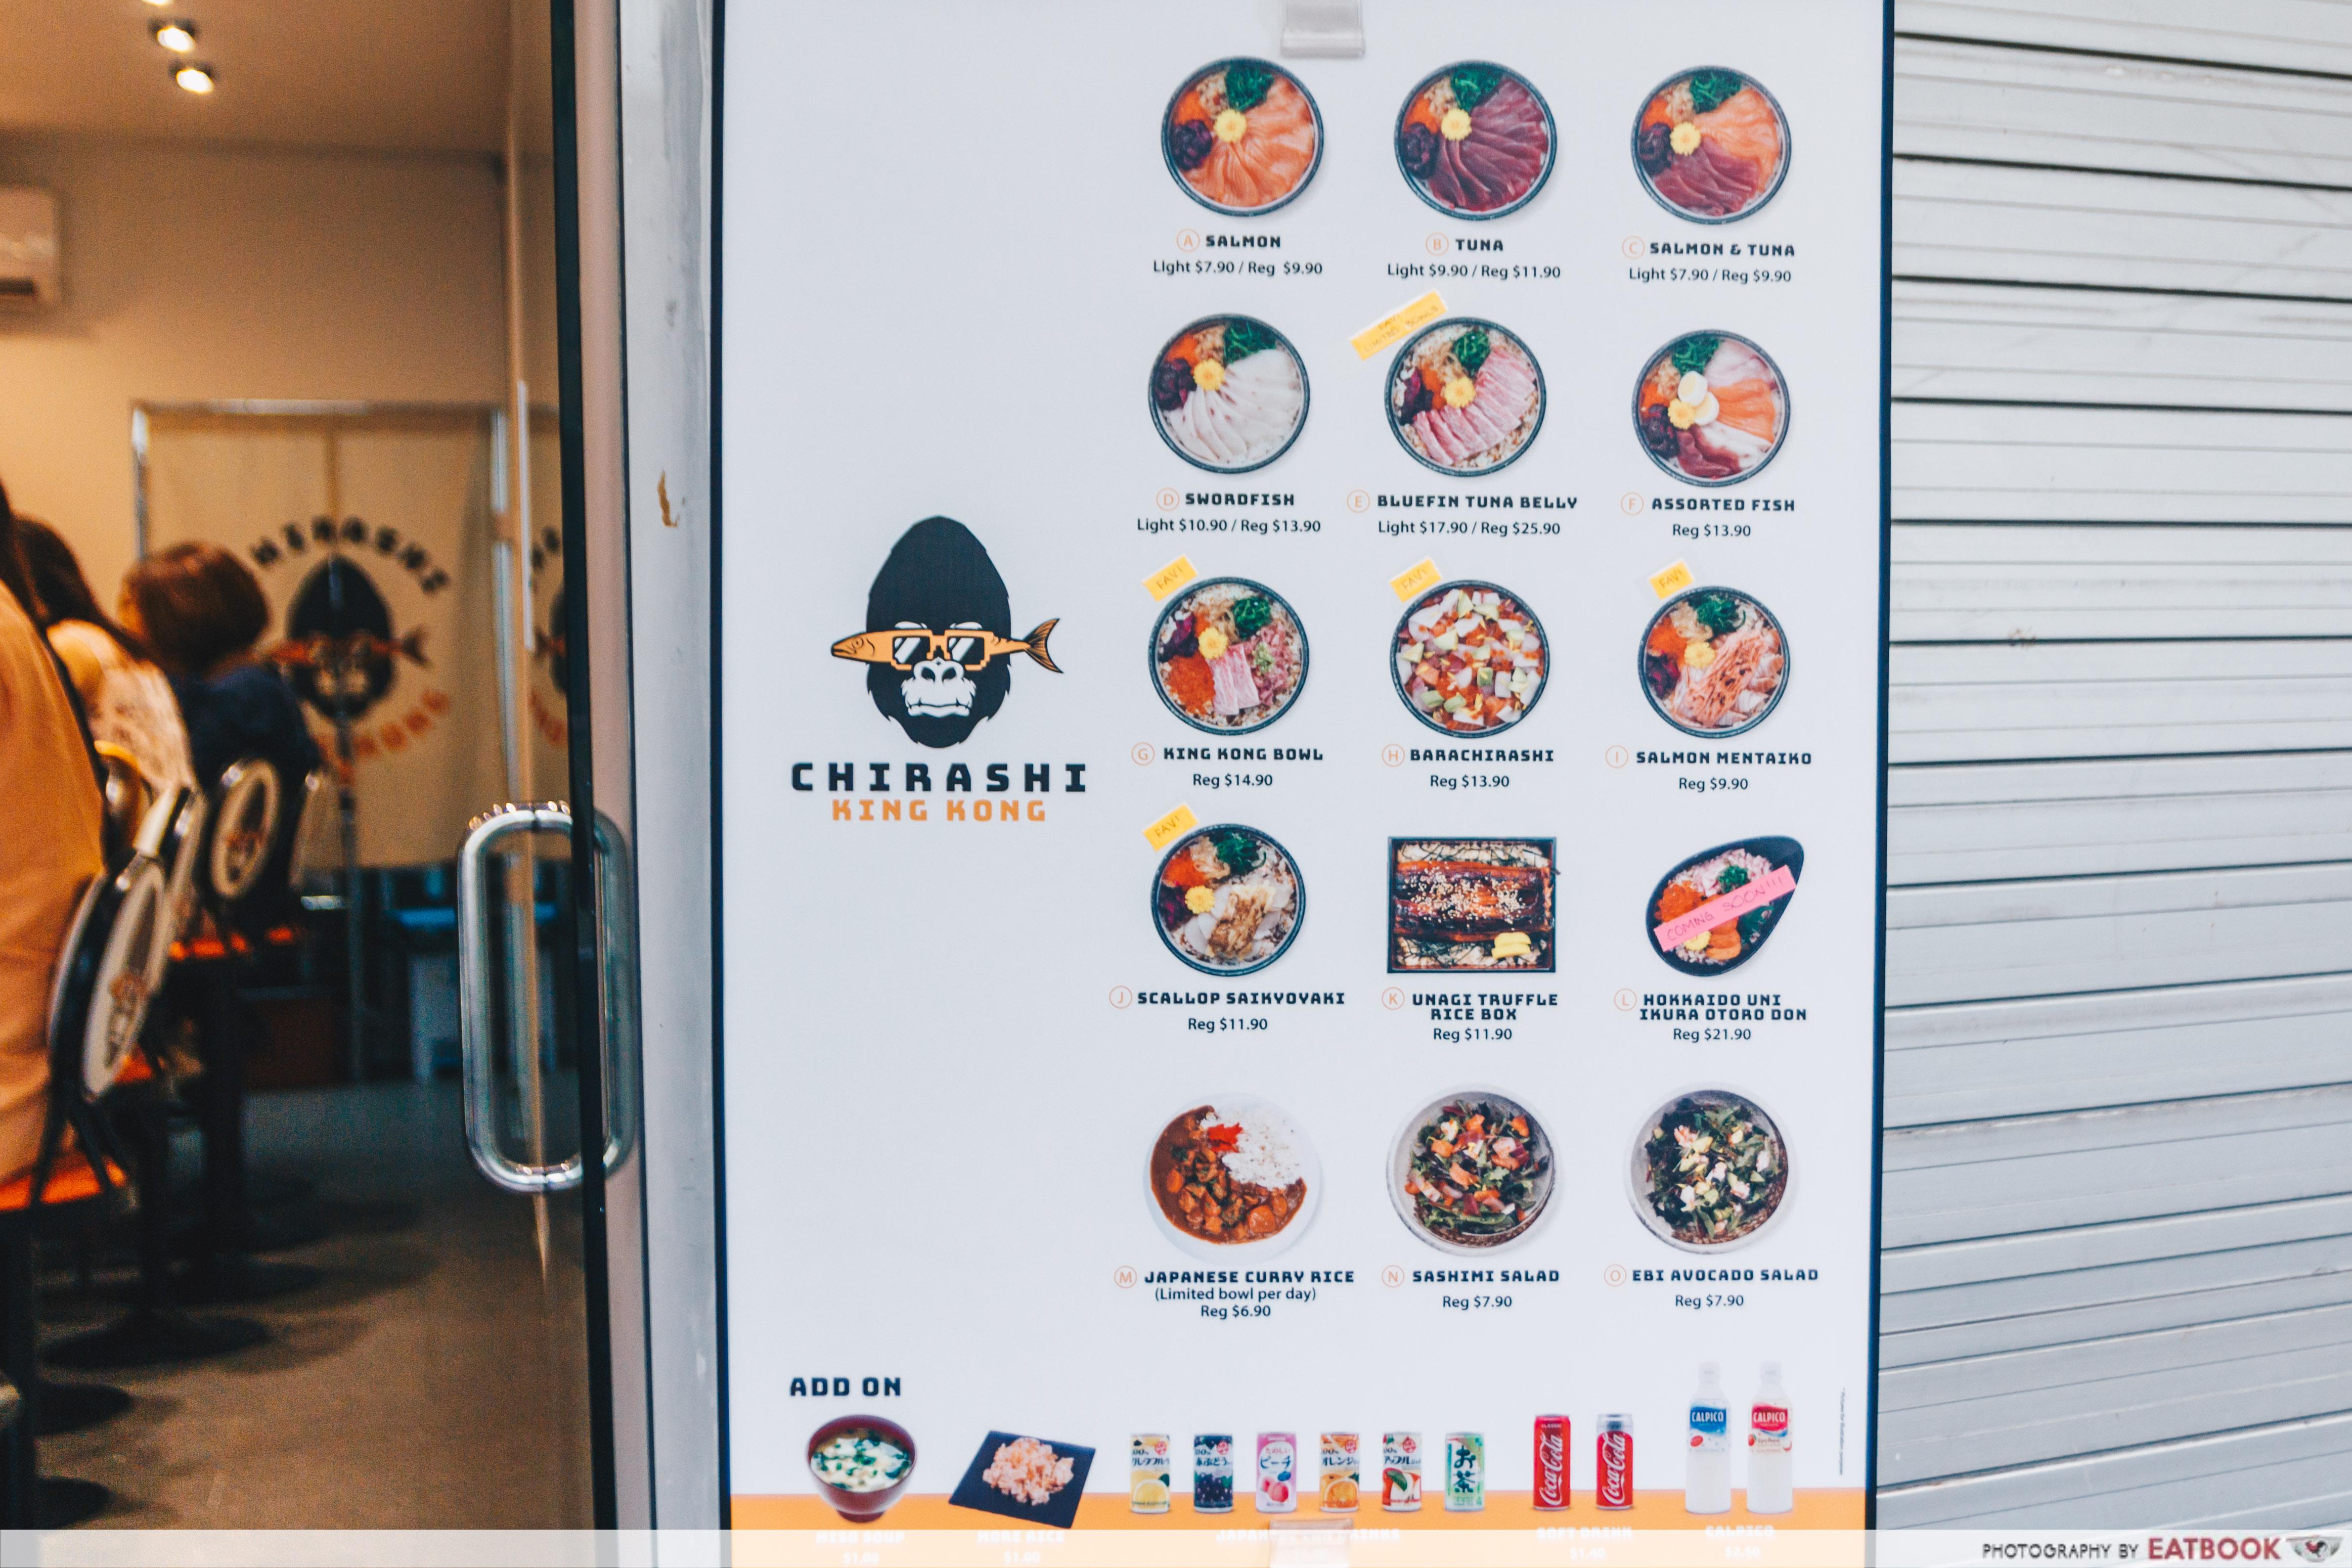 chirashi king kong singapore menu